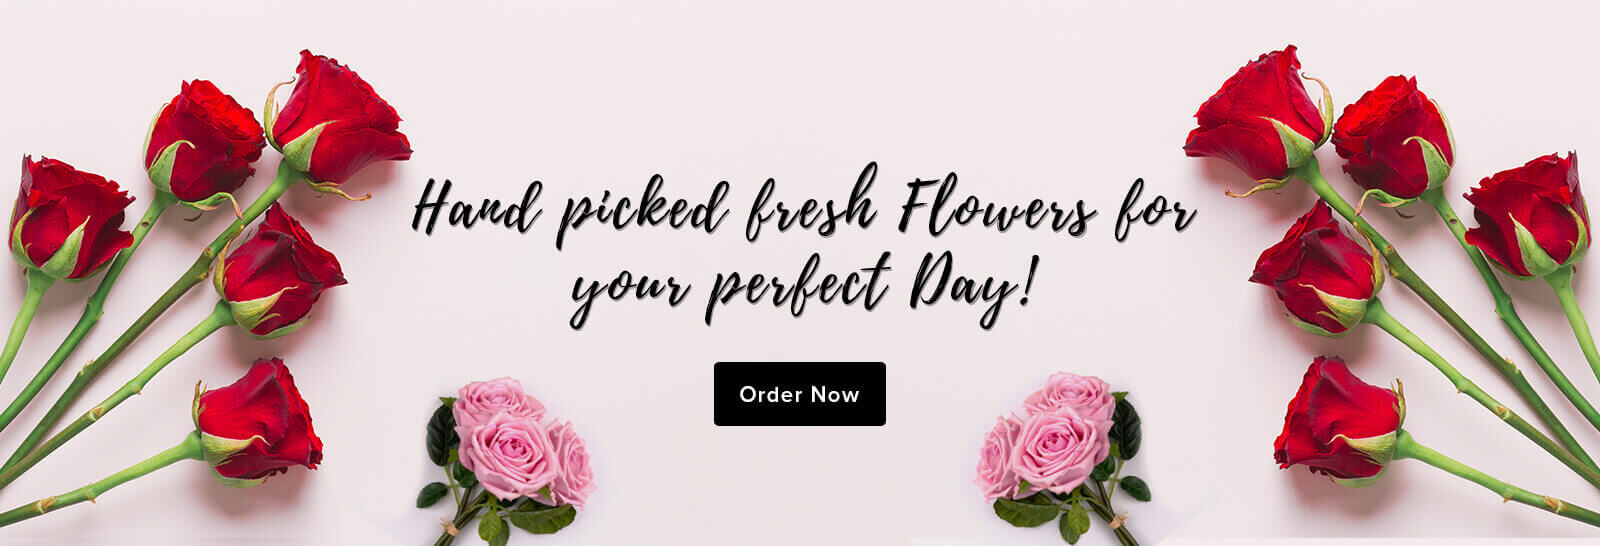 online flower delivery in kolkata